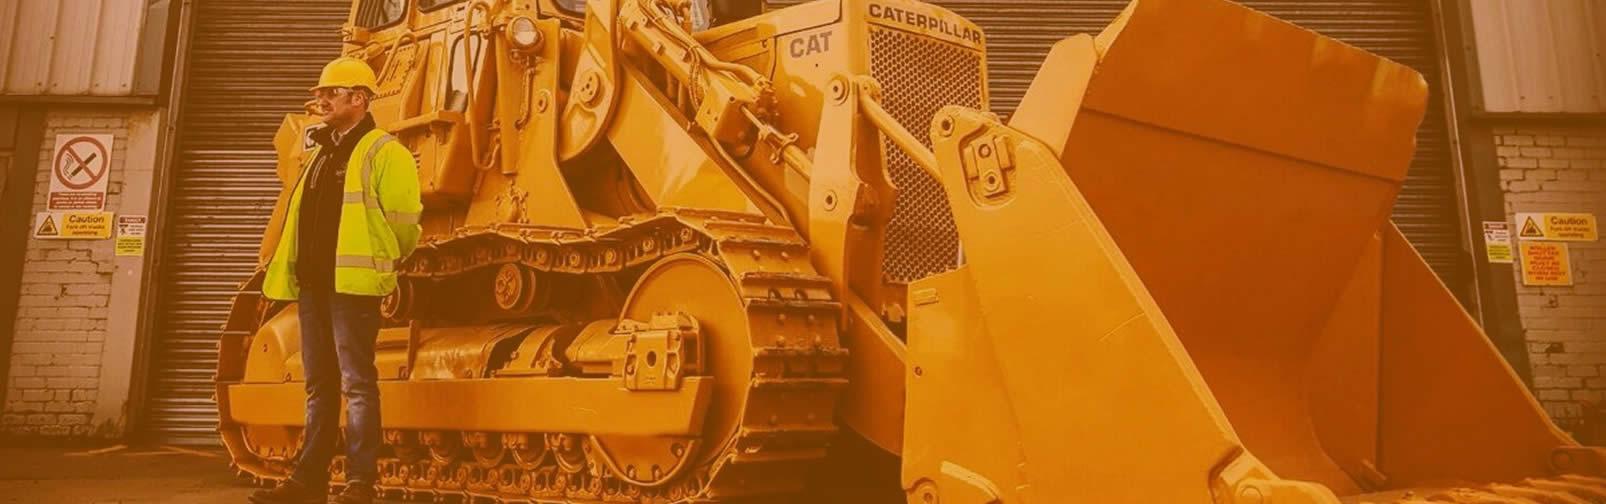 Restoring the CAT977